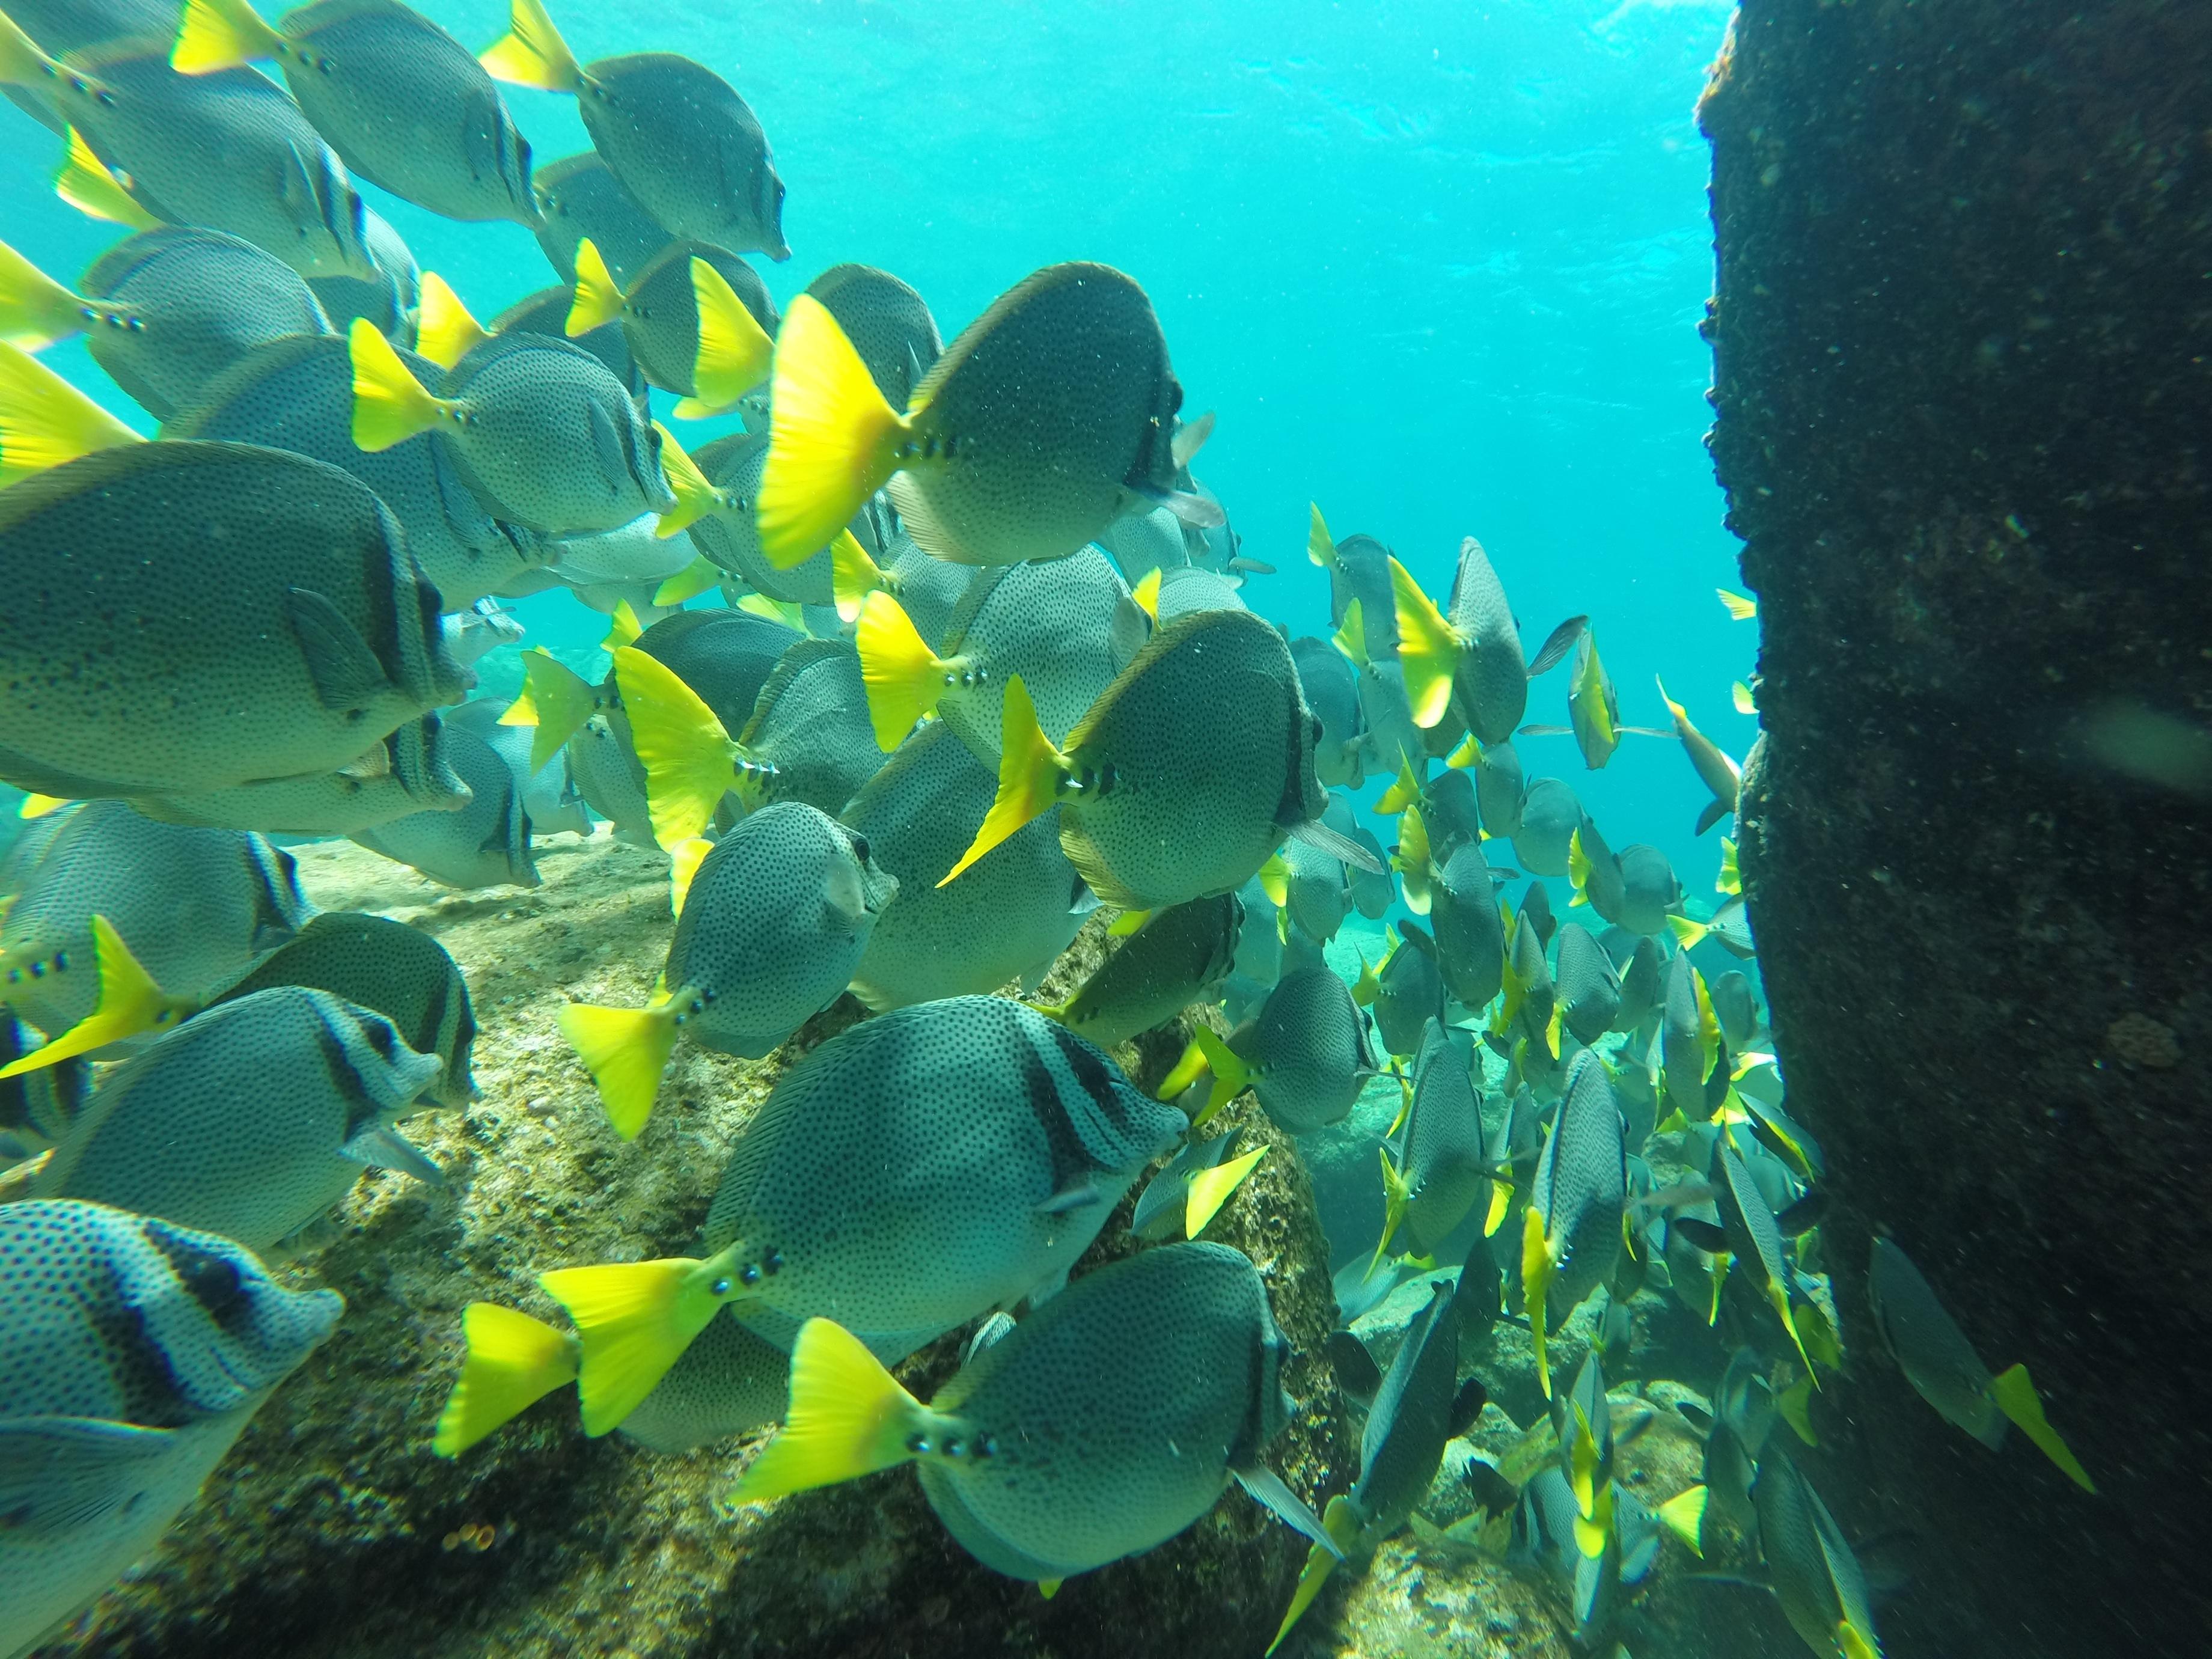 Free images beach sea water nature ocean diving for Green water in fish tank